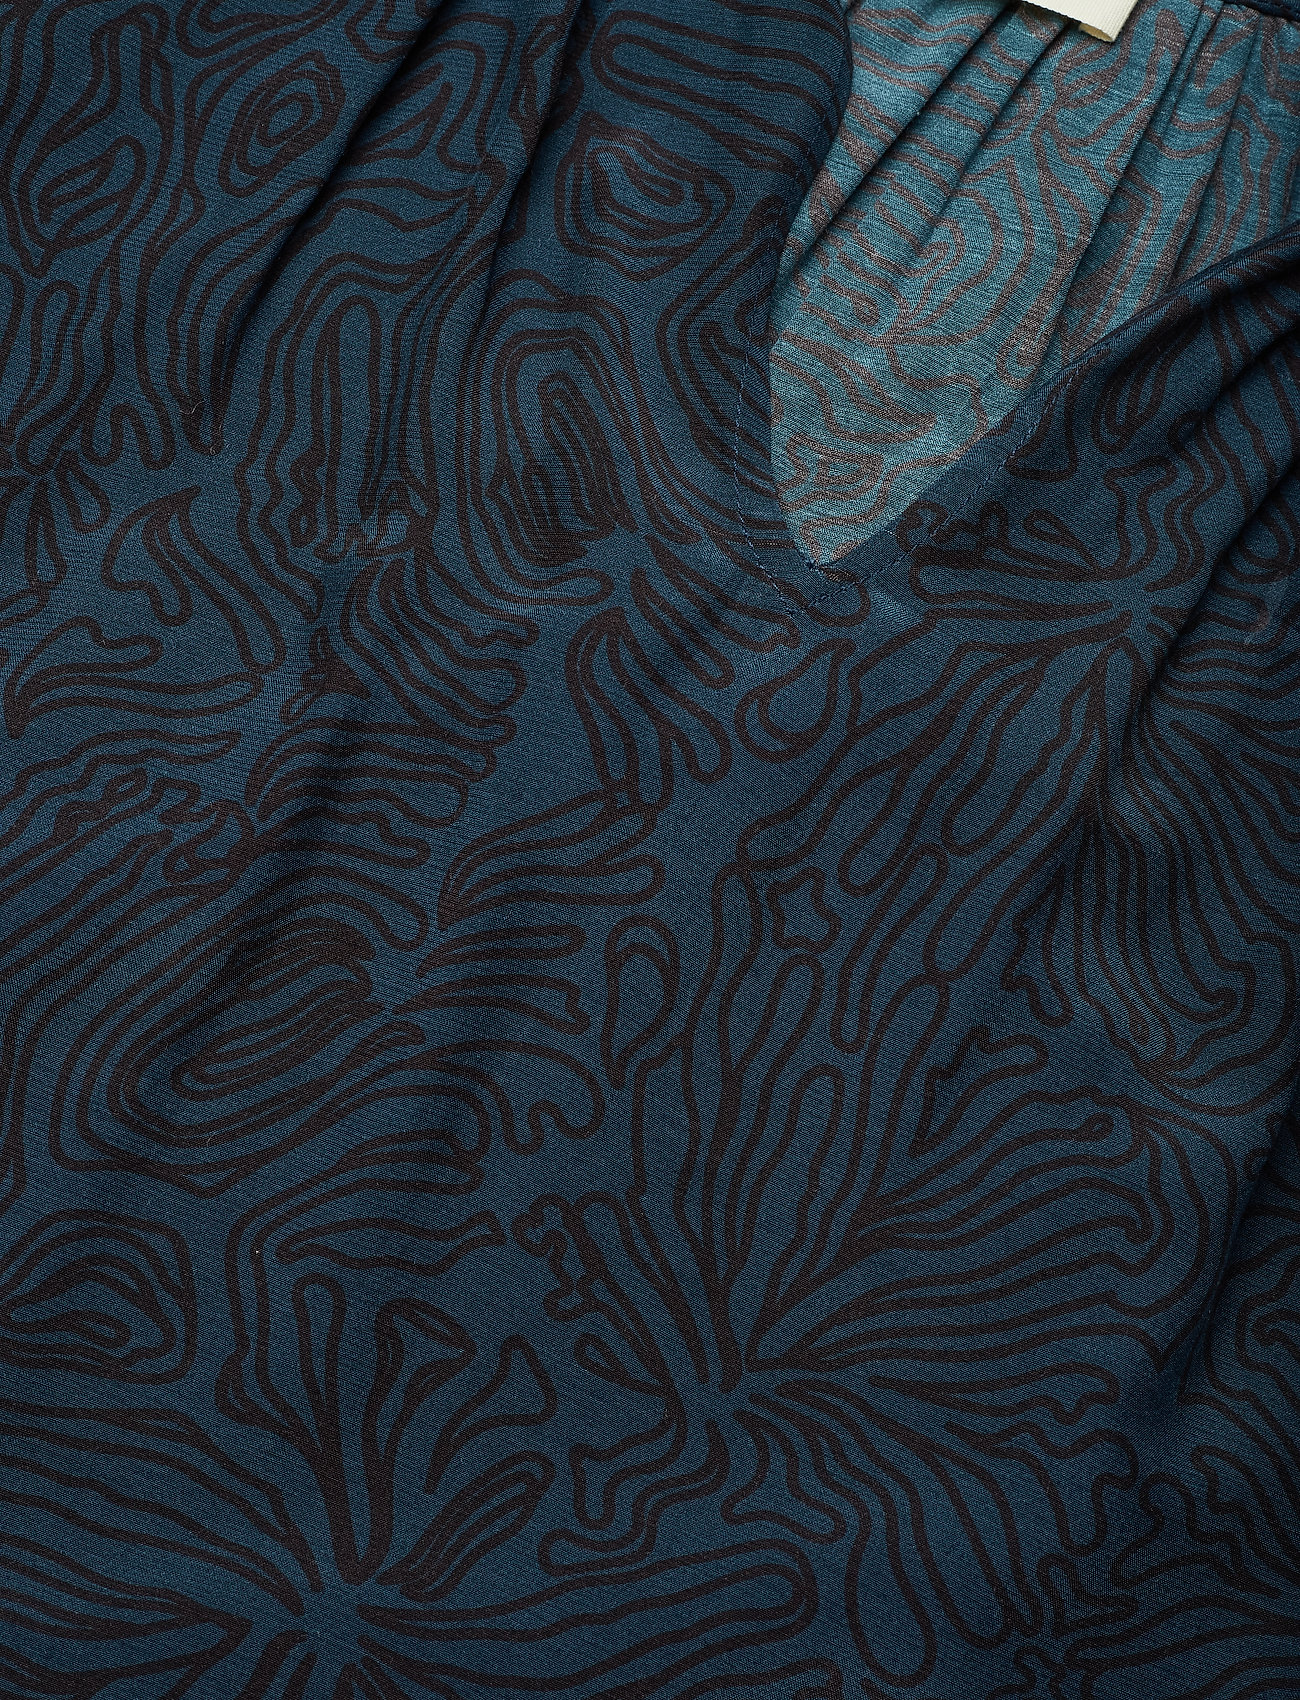 Särskild rabattDakota Dress Frogfish Print 1470 Mayla Stockholm qmFaJ B5xVq